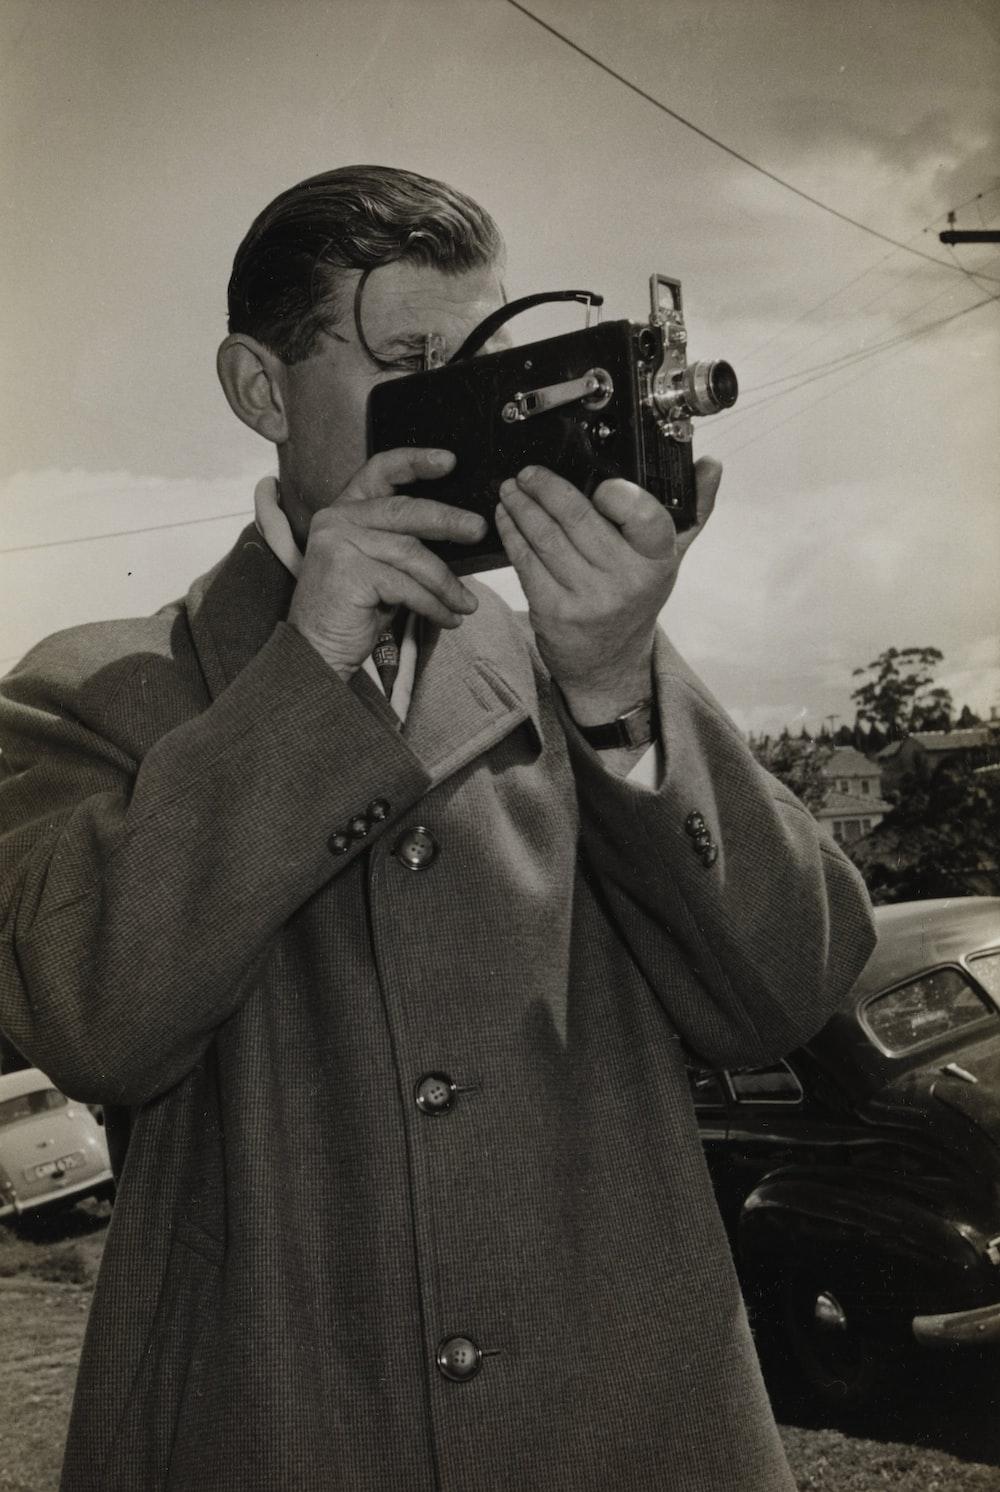 man holding black camera